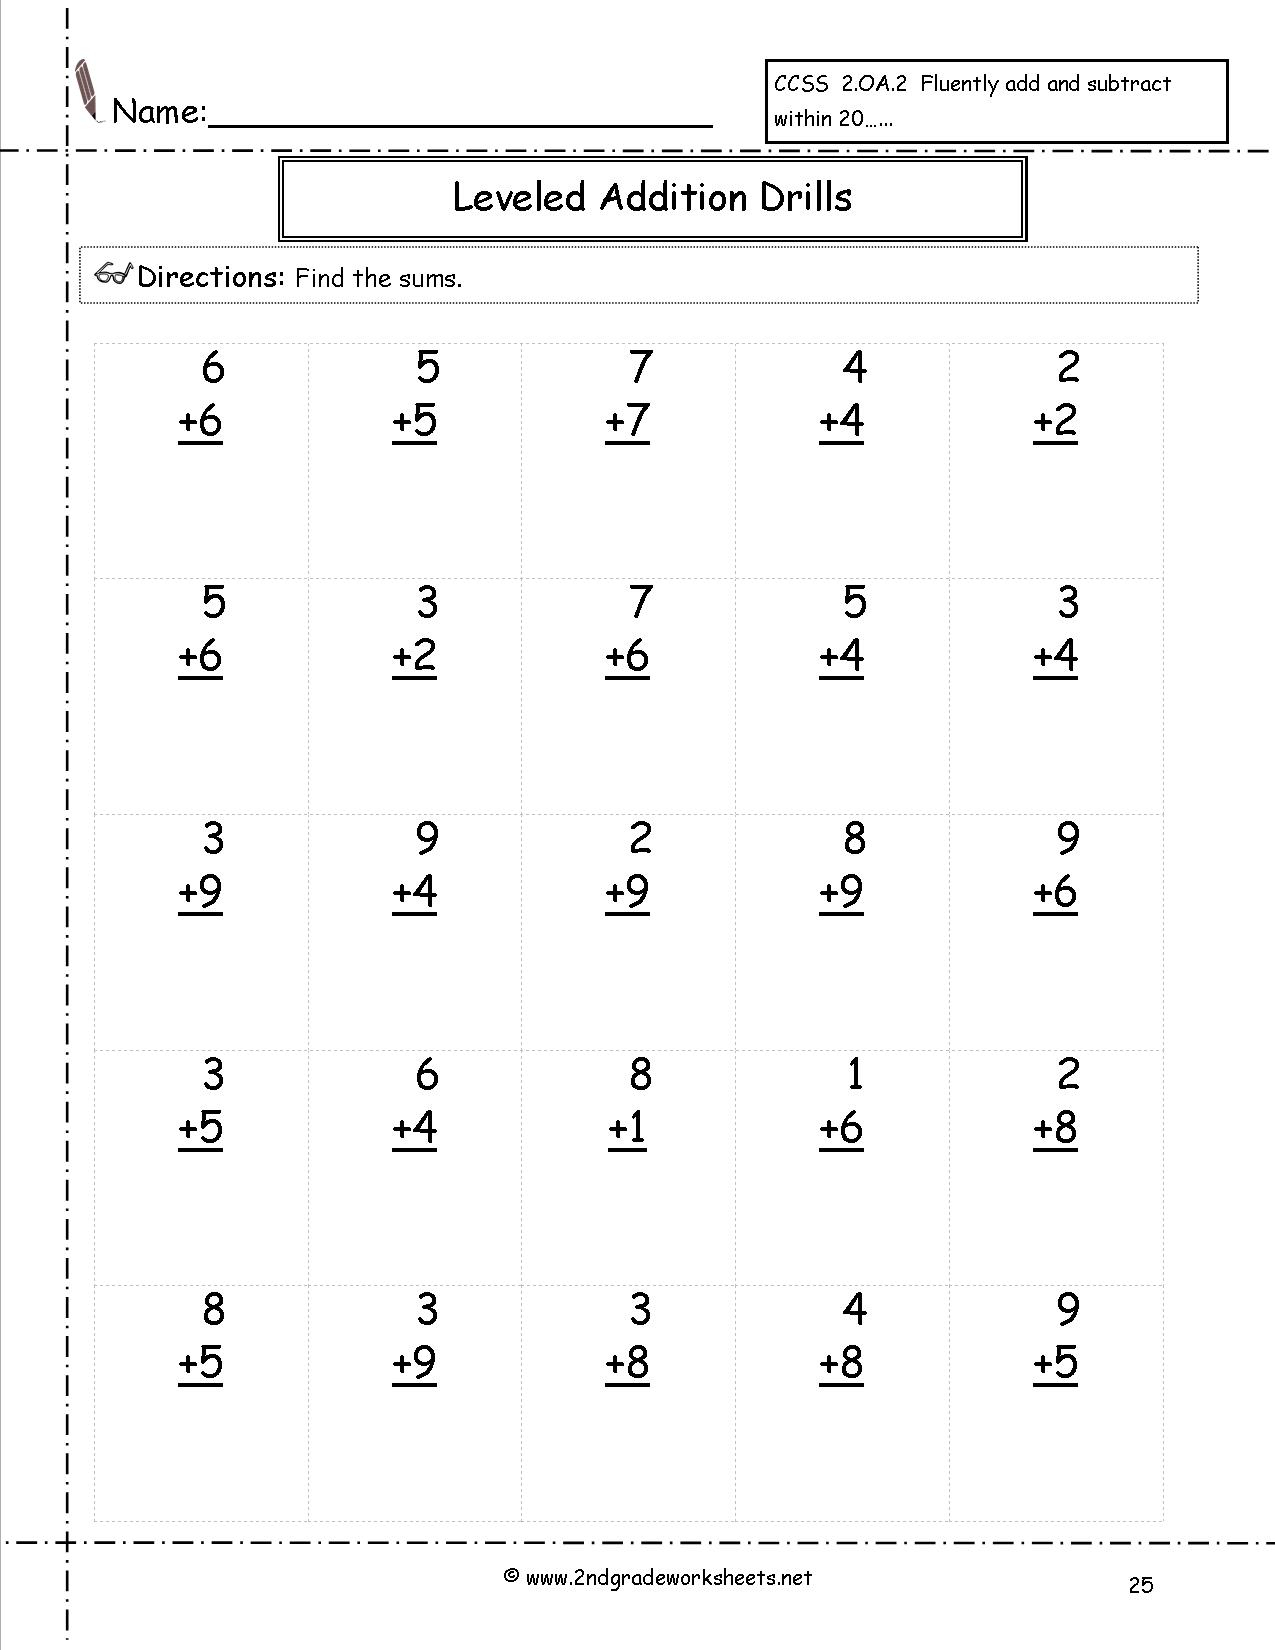 Free Math Worksheets And Printouts - Free Printable Multiplication Worksheets